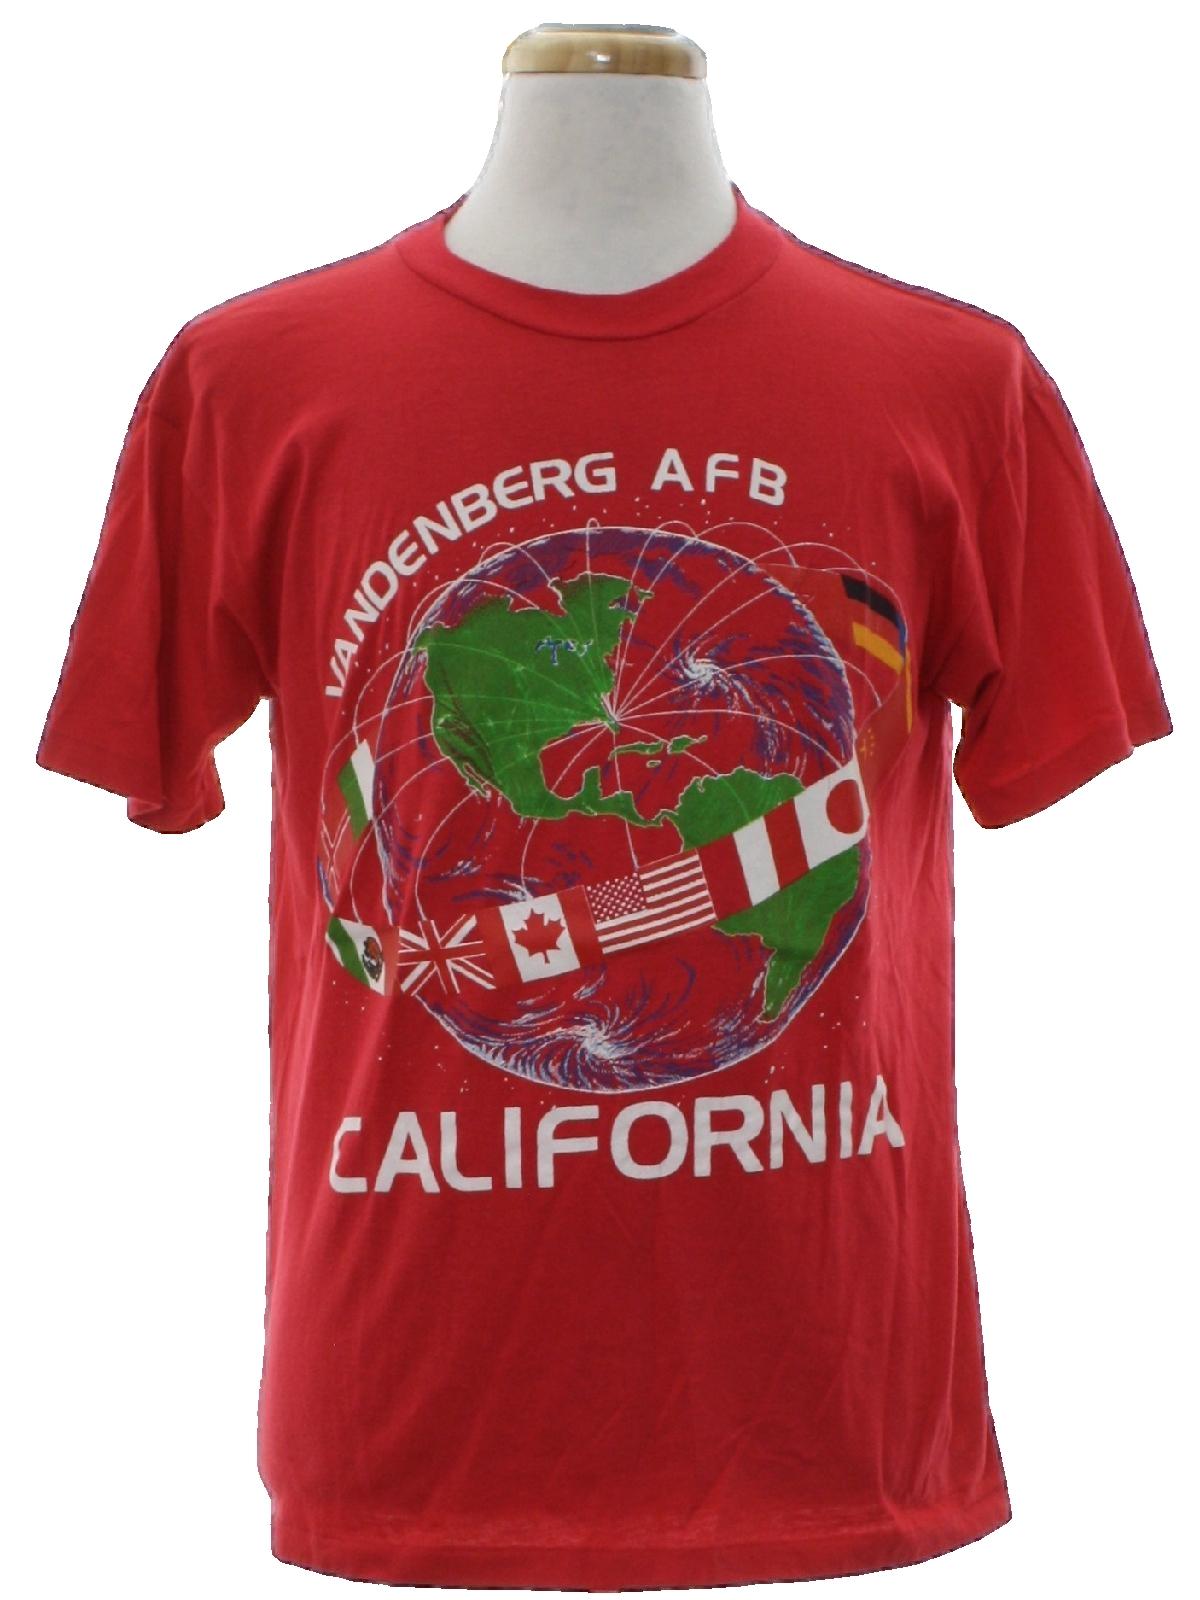 artex shirts vintage